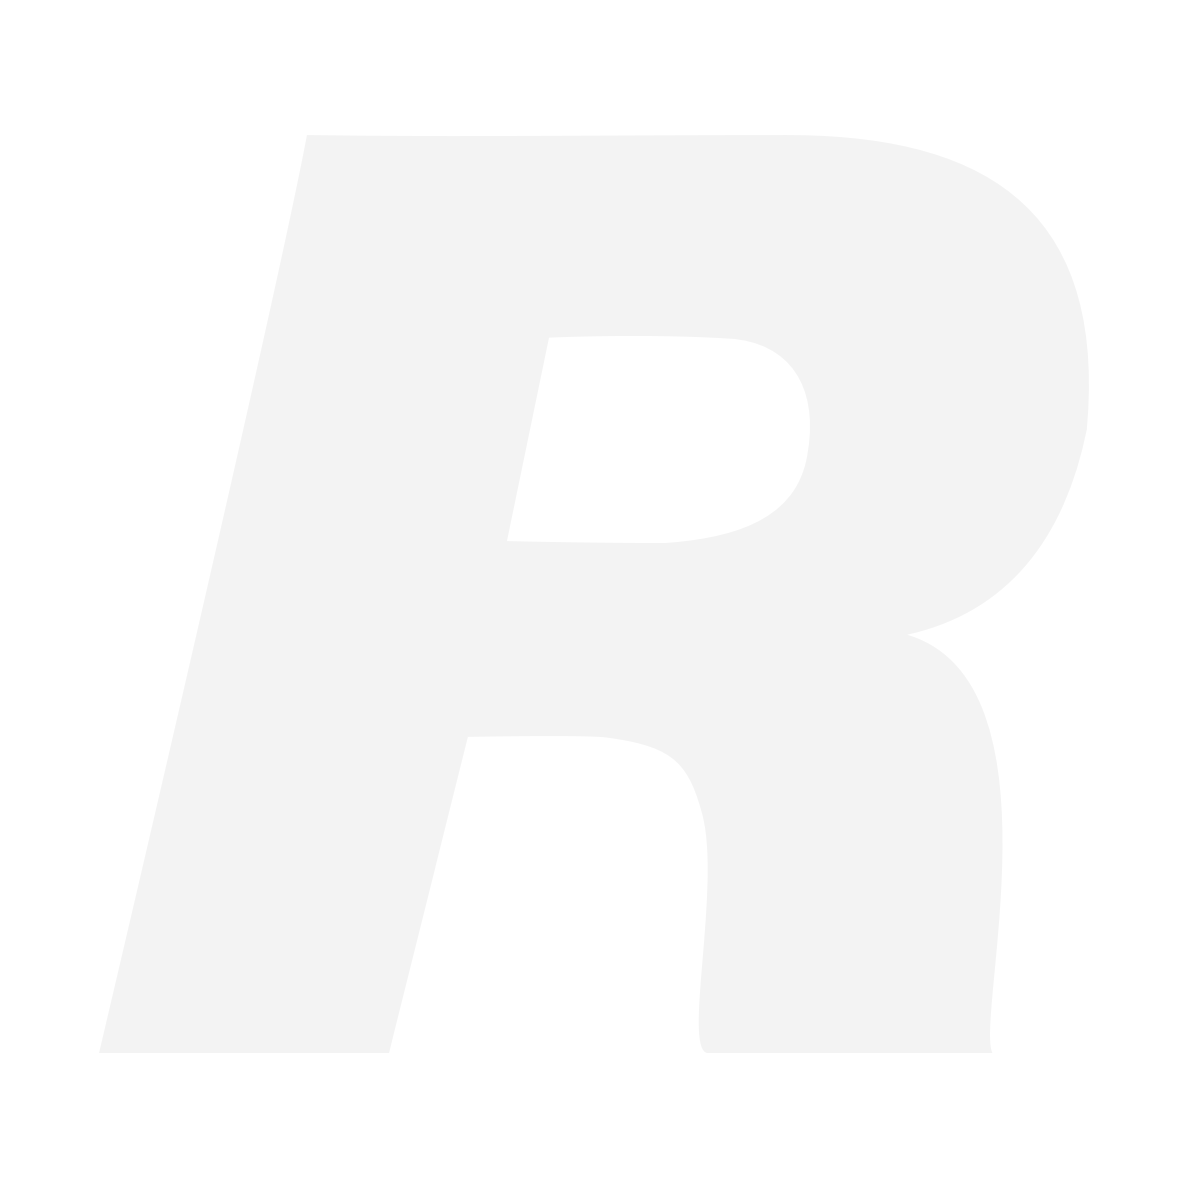 MICNOVA MQ-TMR2 TRIPOD MOUNT RING